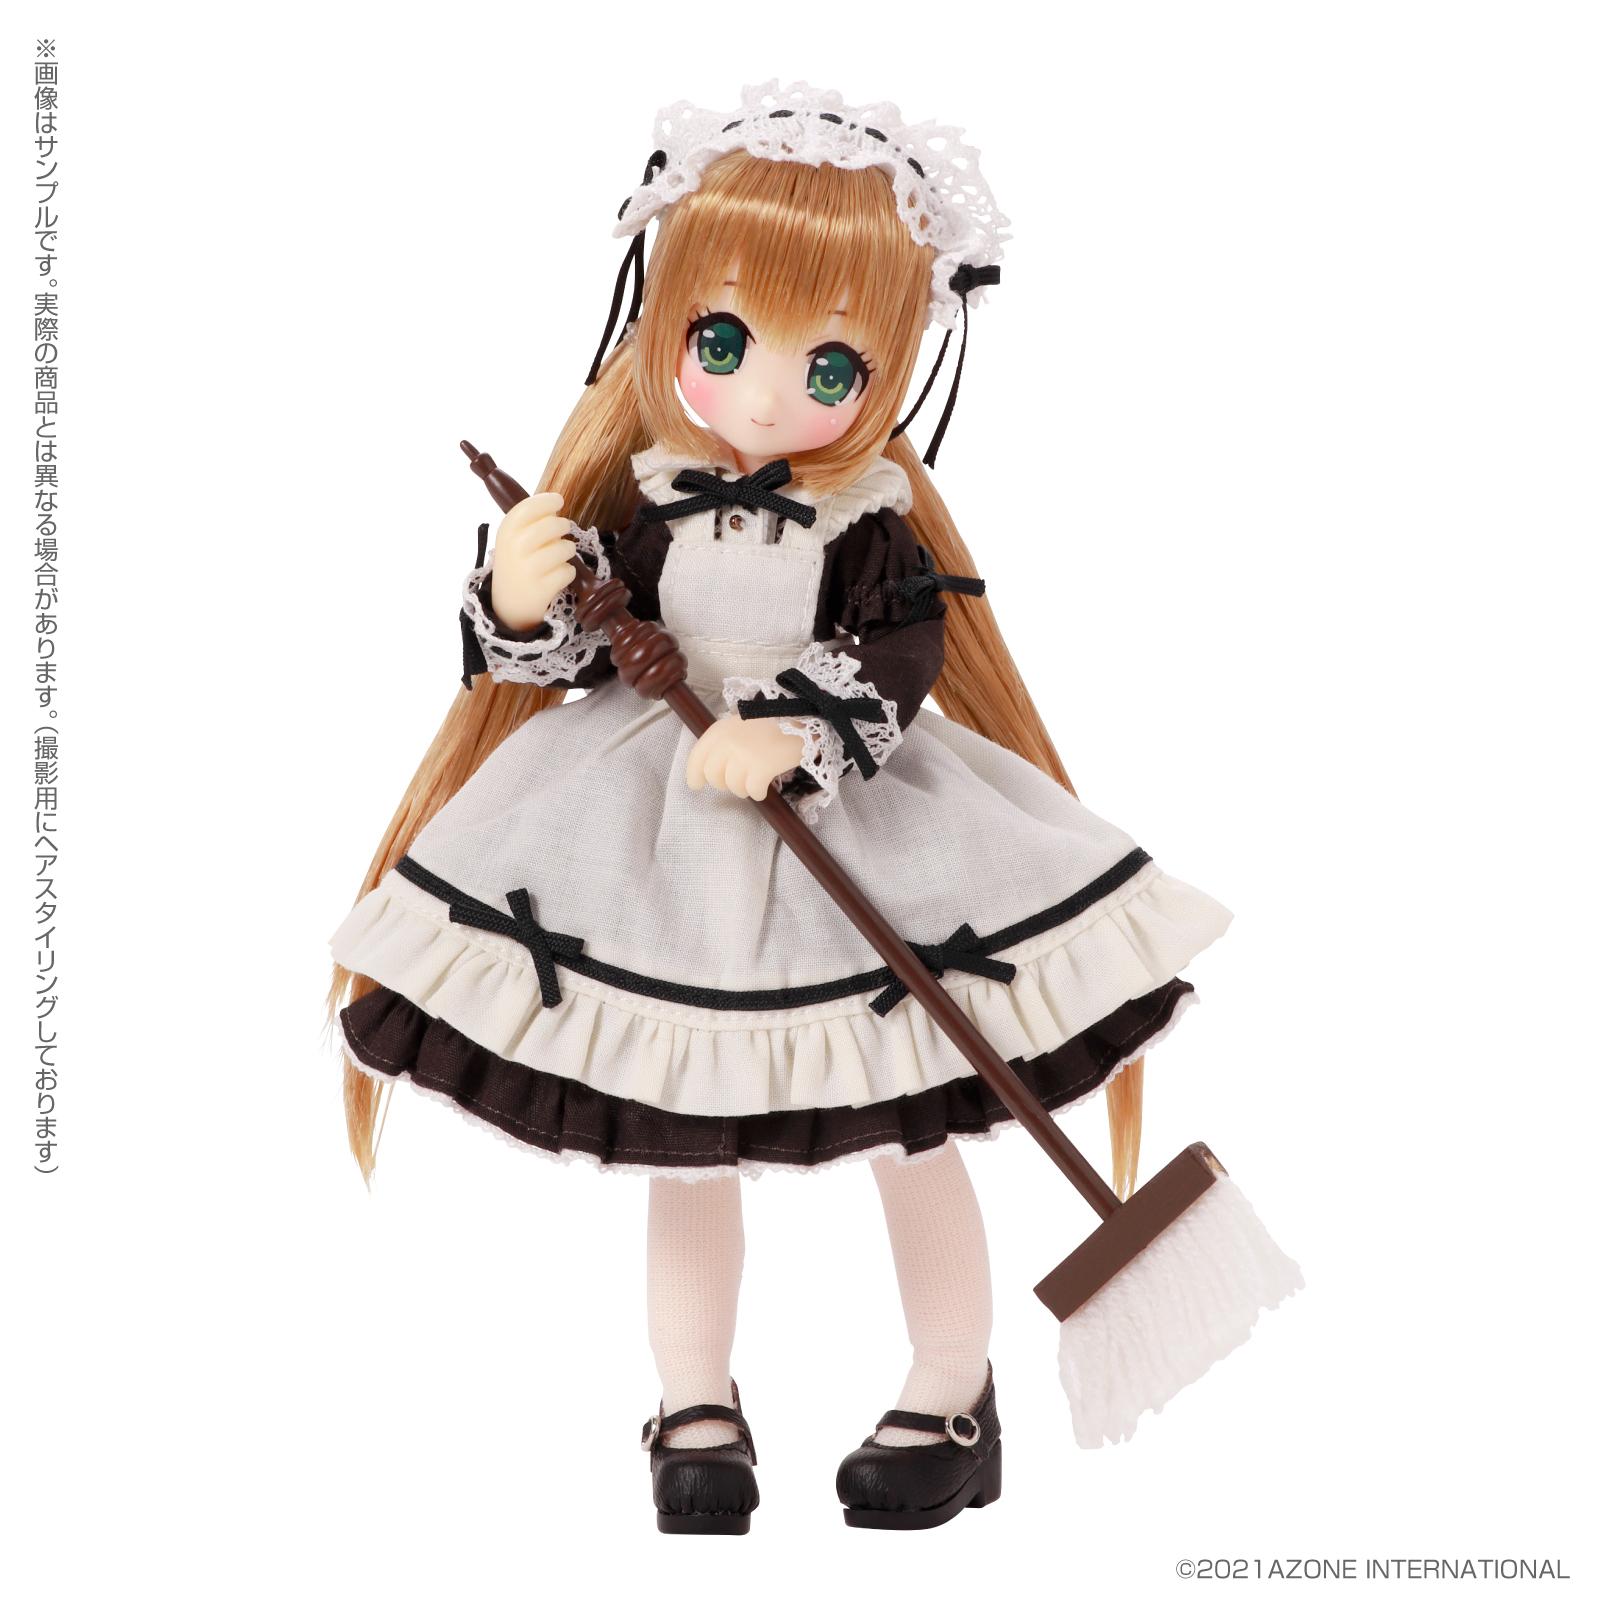 Lil'Fairy ~ちいさなお手伝いさん~『リプー 7th anniv.(ノーマル口ver.)』1/12 完成品ドール-017